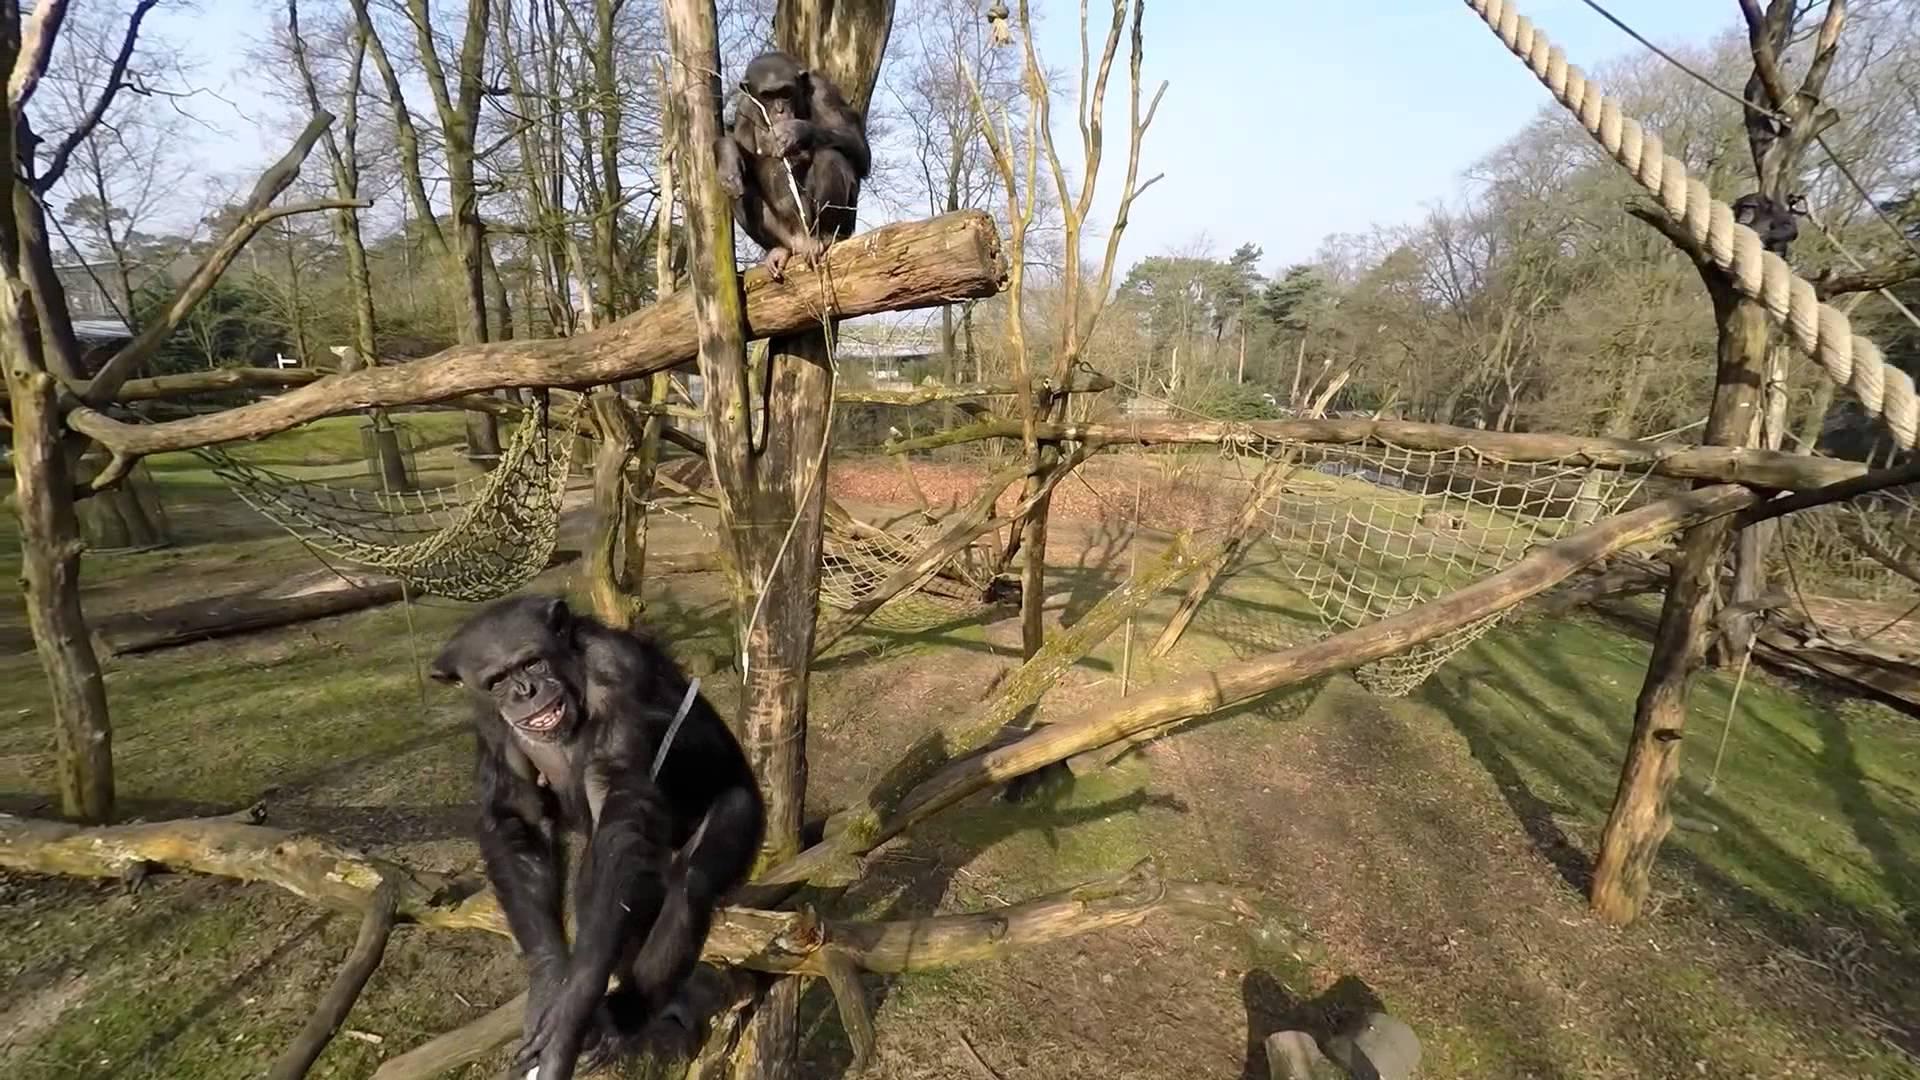 Este deber ser sin duda un chimpance de Andres Martinez